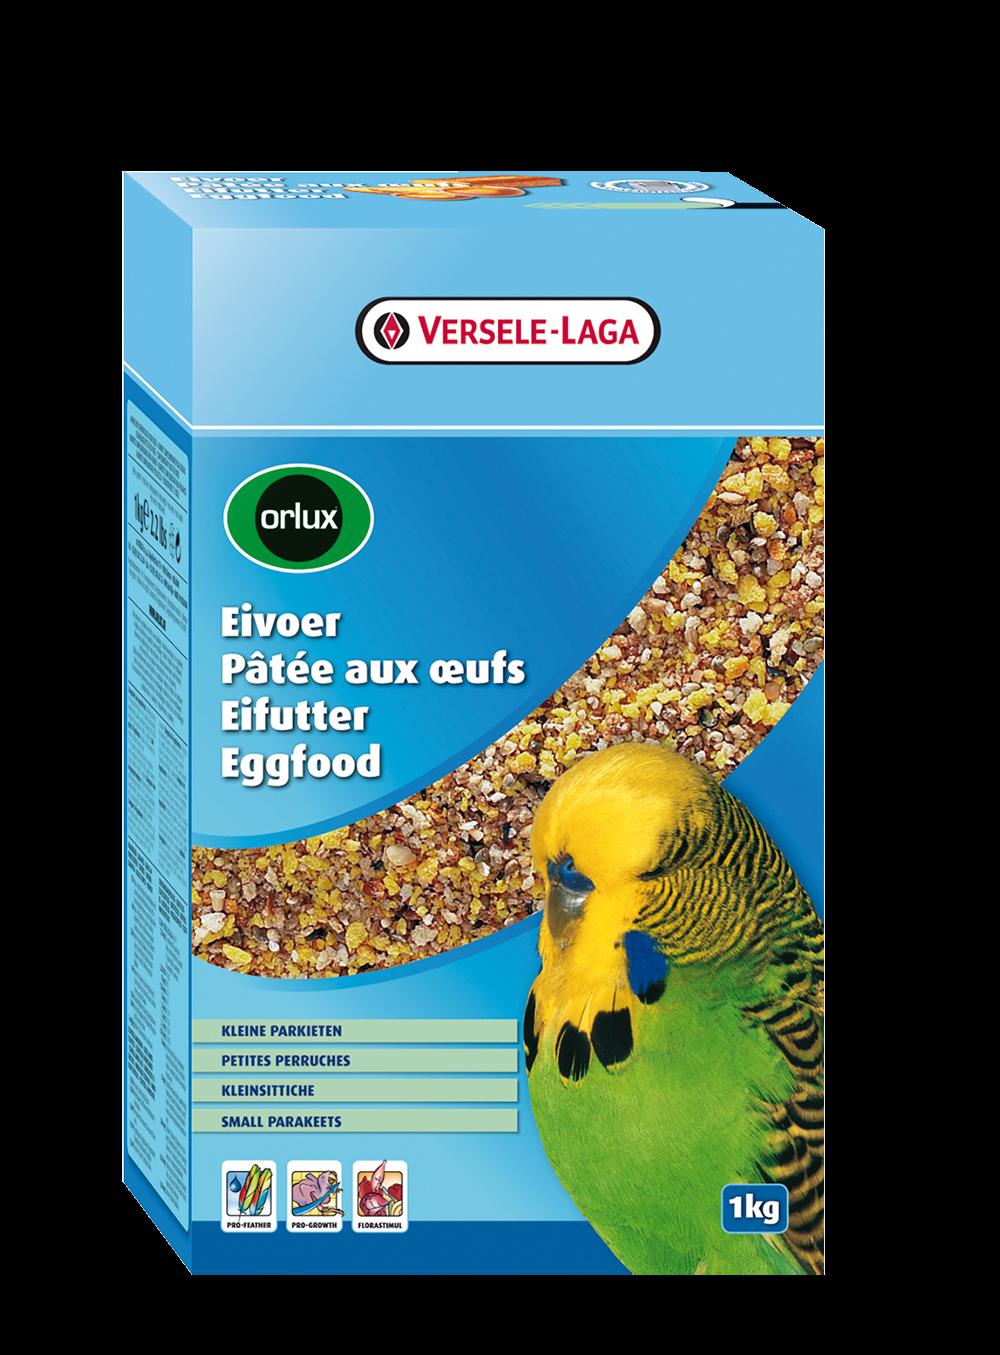 Versele-Laga Orlux Eivoer Kleine Parkieten 1 kg